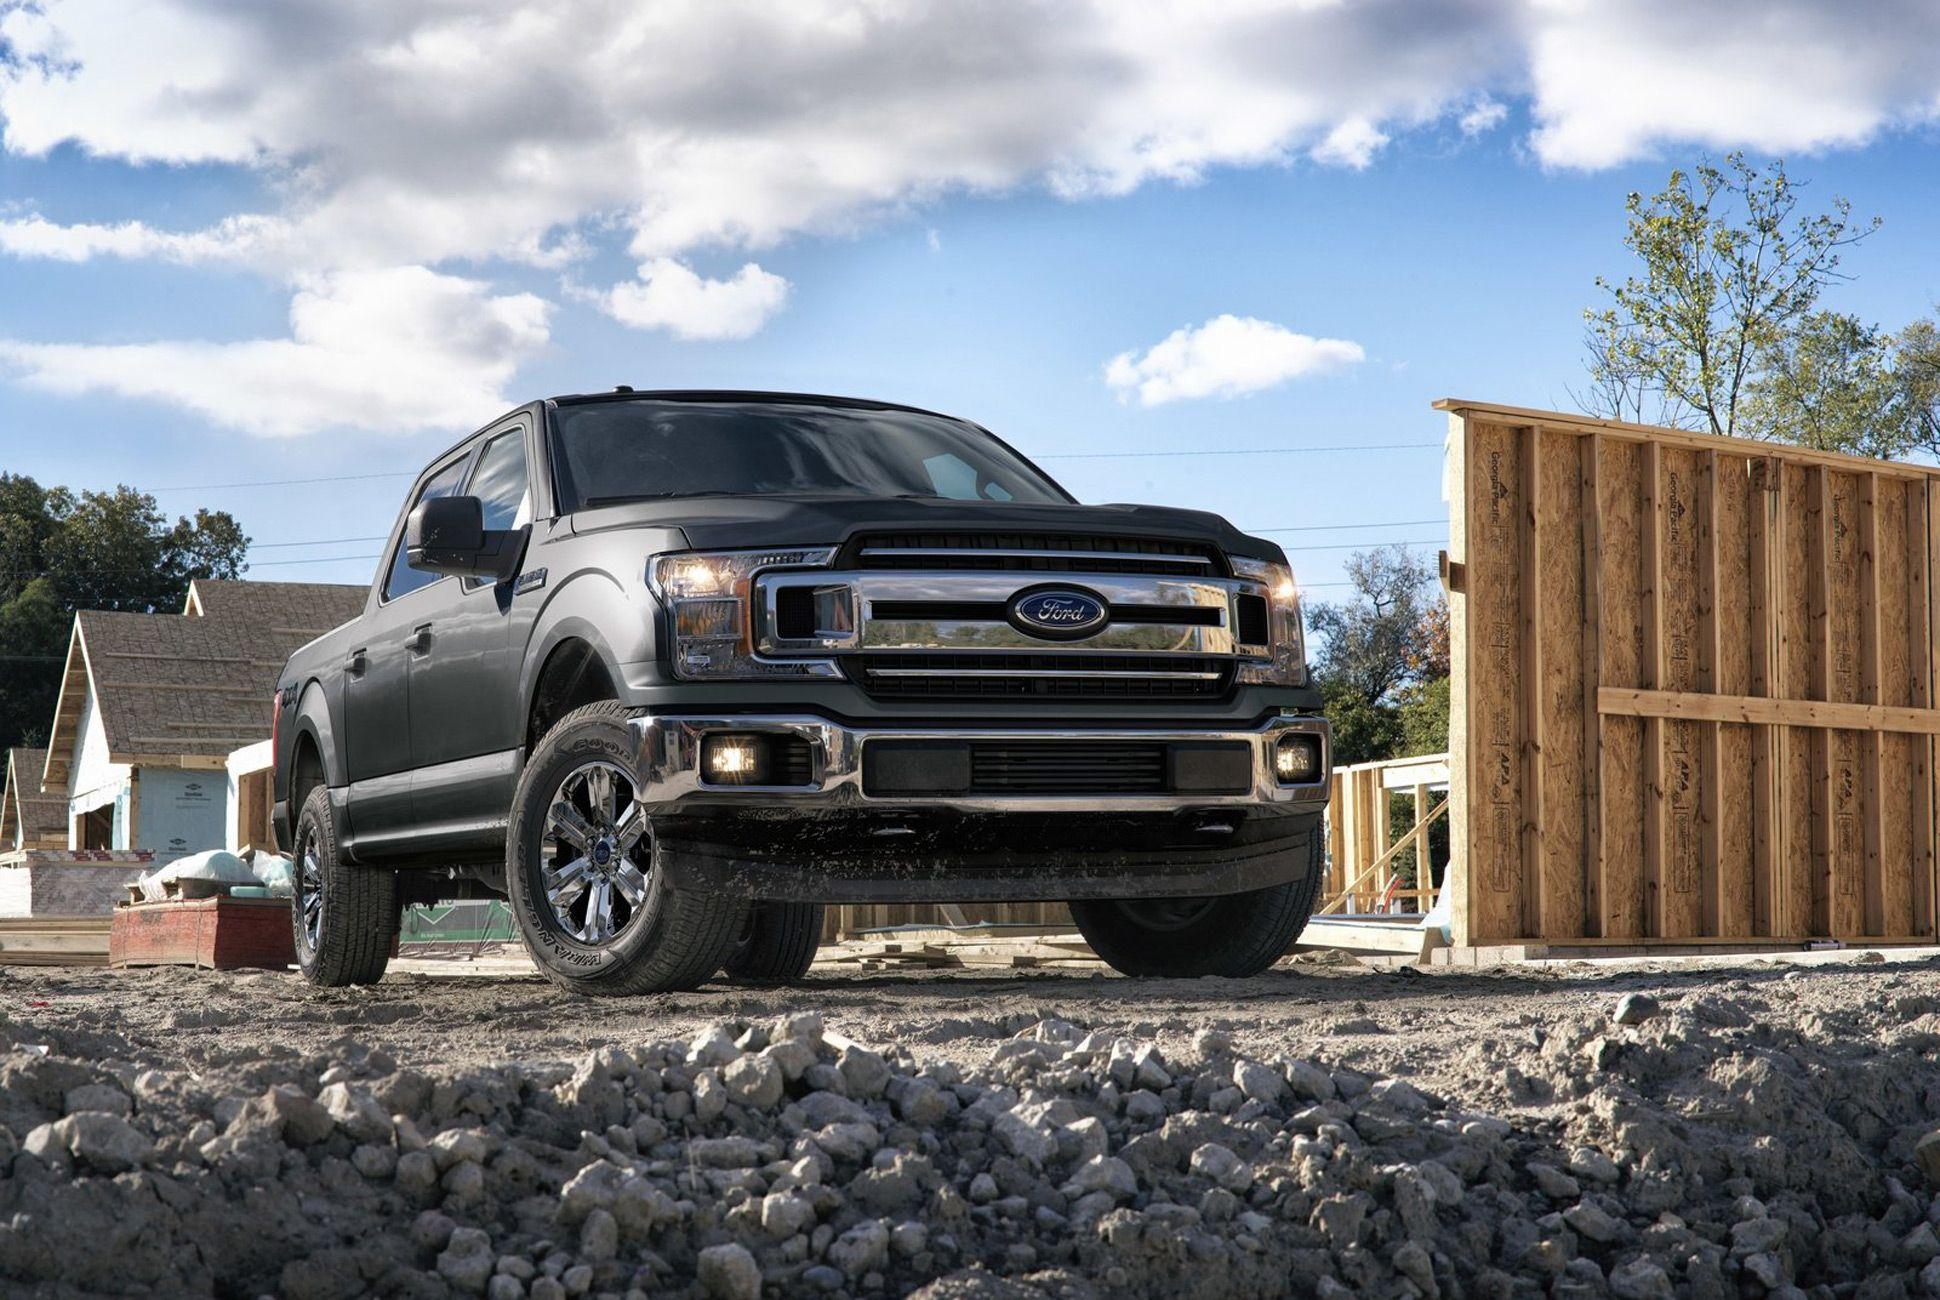 The 25 Best Cars Under 50,000 in 2017 Pickup trucks